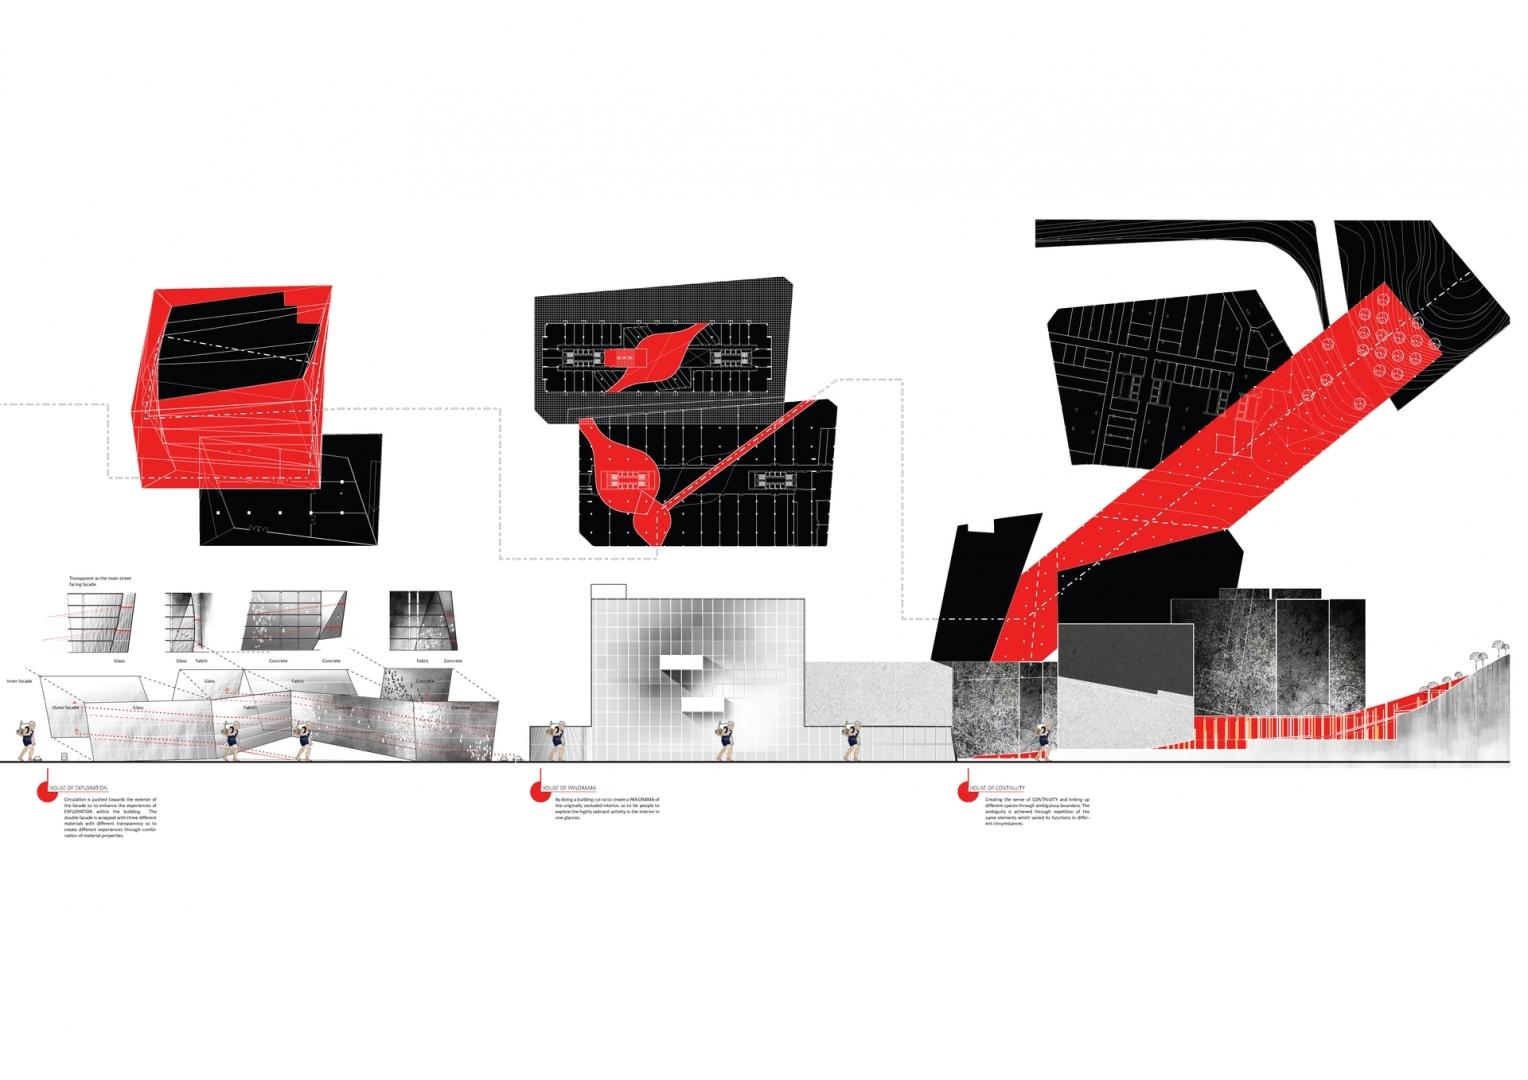 Enlarge Photo: Architecture as Art Medium: Theme Park of Architectural Phenomena 6